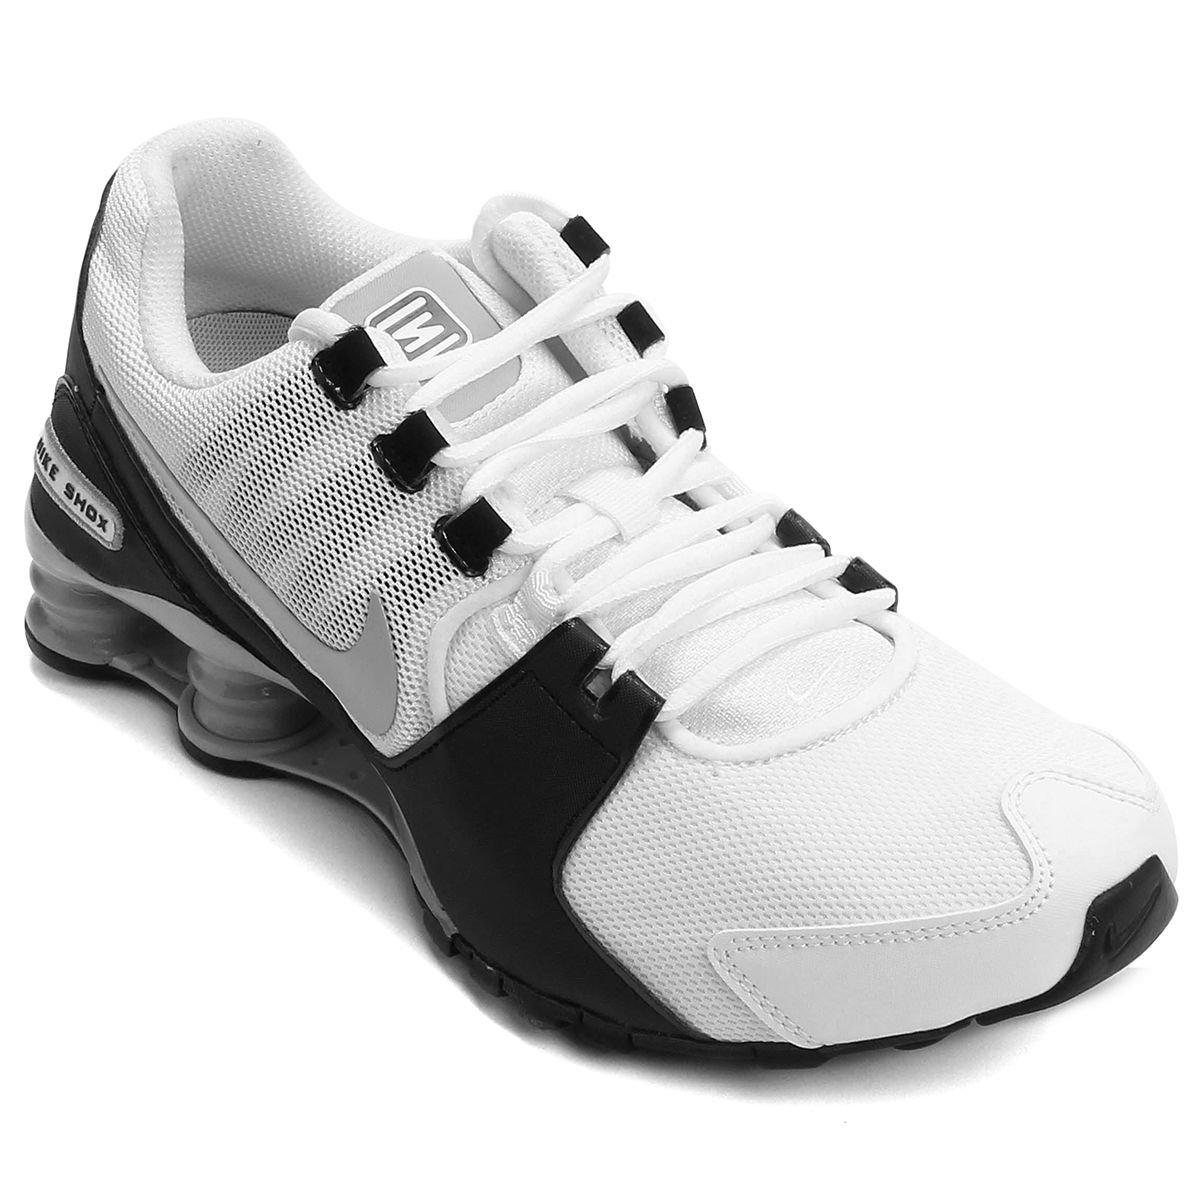 823f3bc57e1 Tenis Nike Shox Avenue 833583-001